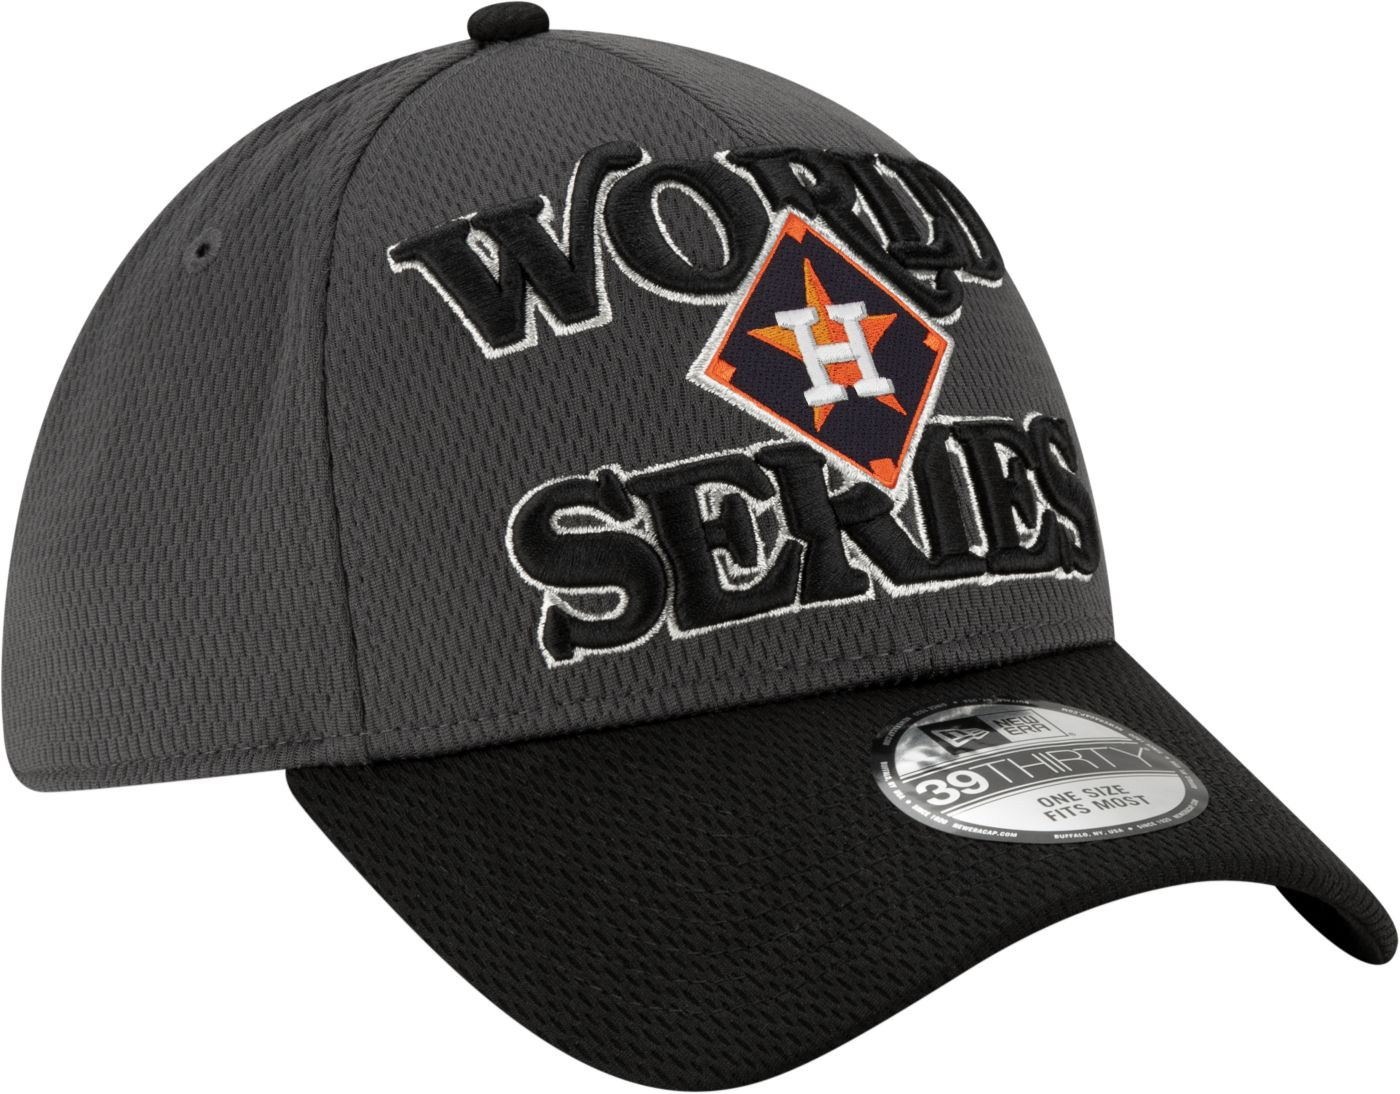 New Era Men's 2019 American League Champions Locker Room 39Thirty Houston Astros Stretch Fit Hat